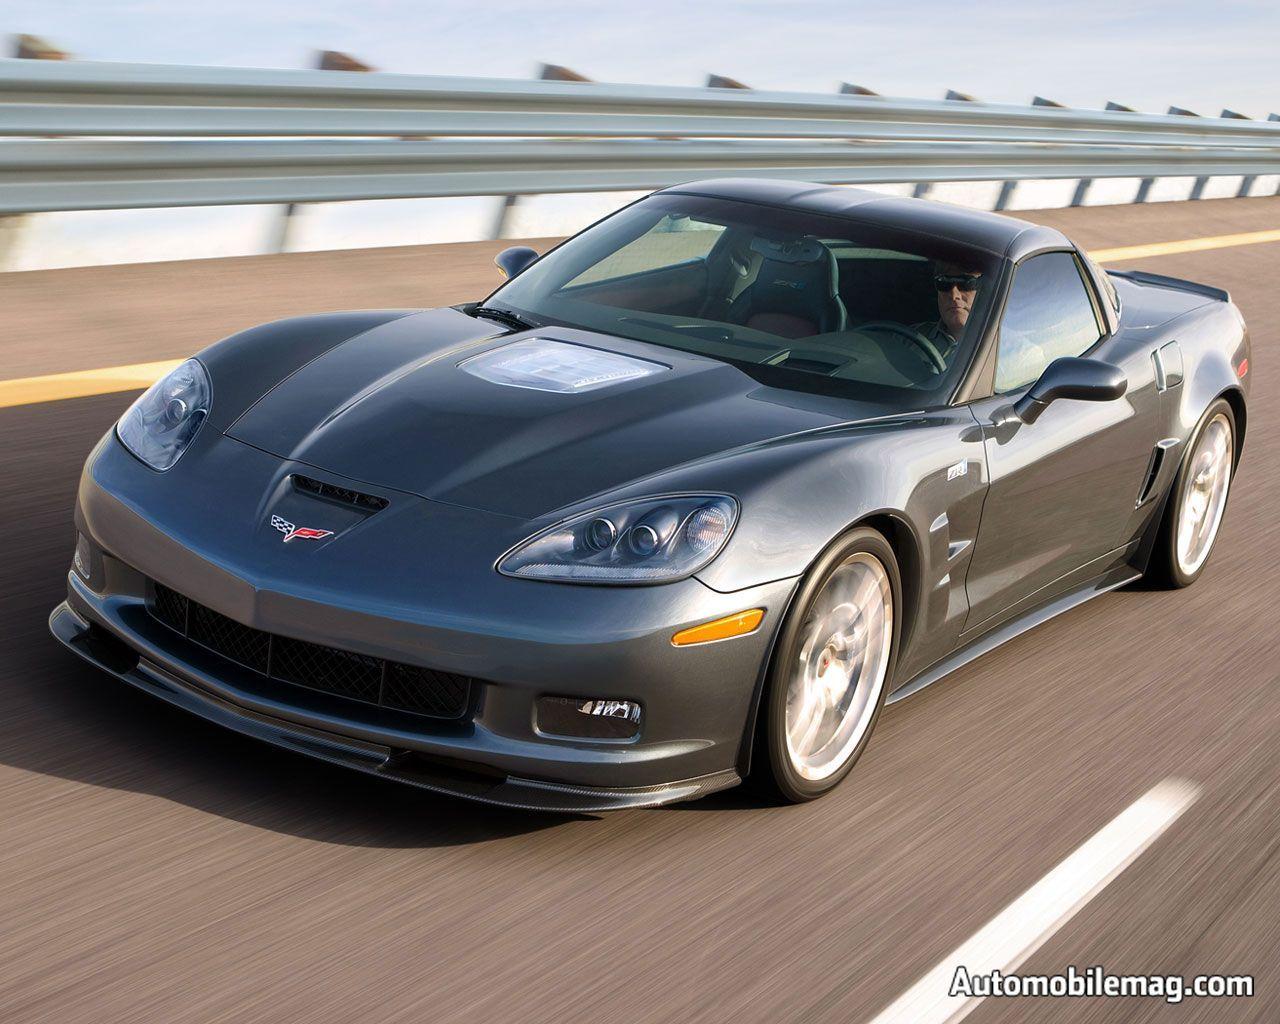 Dream Car - Corvette ZR1